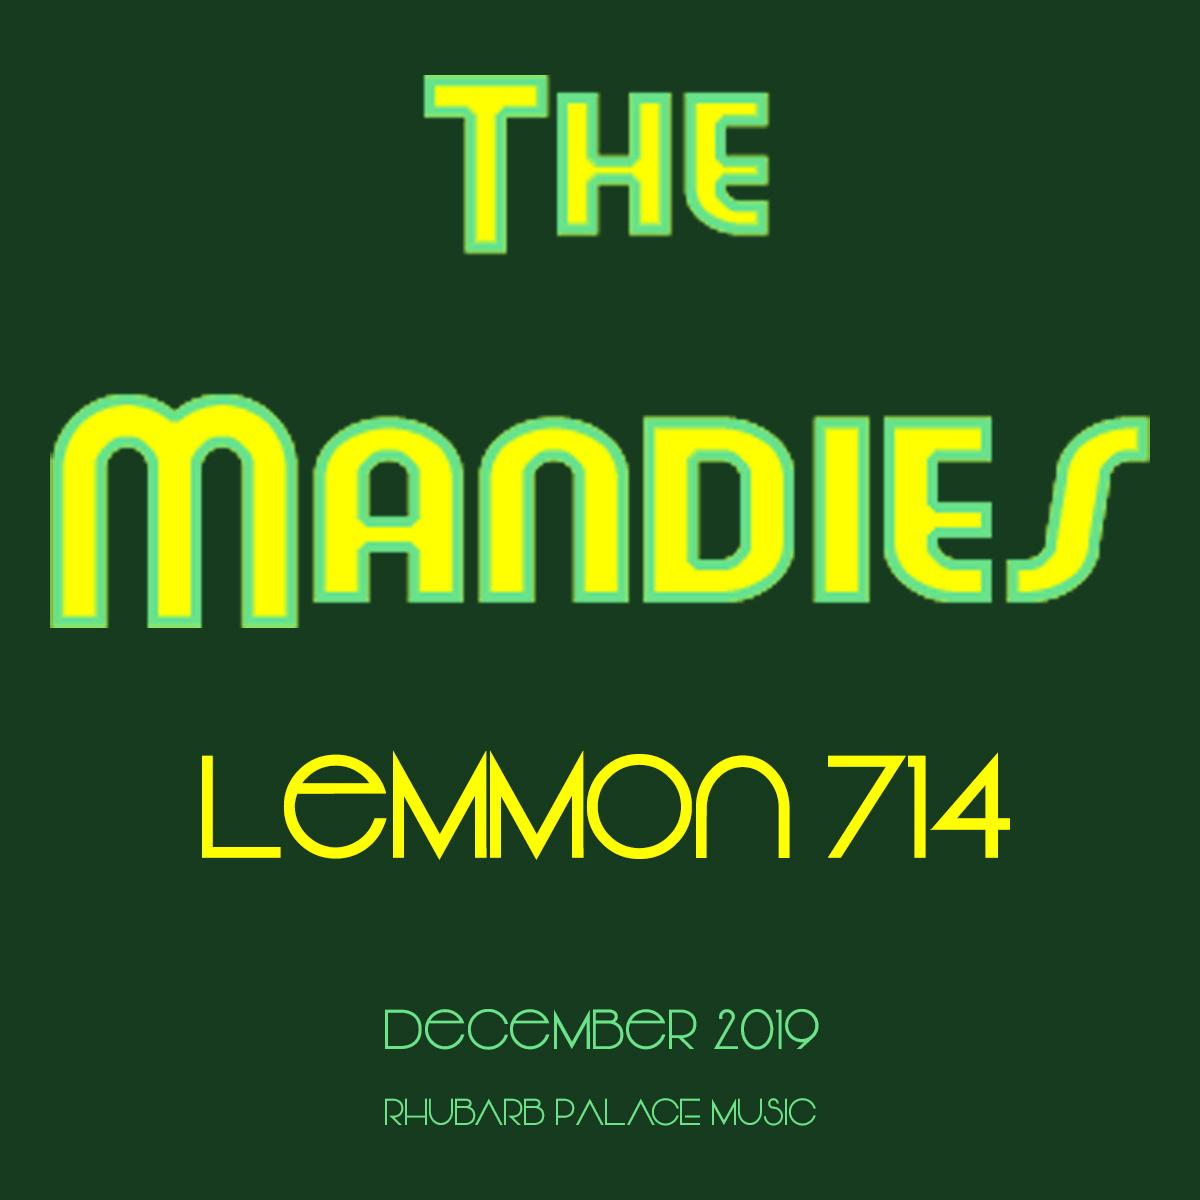 THE MANDIES